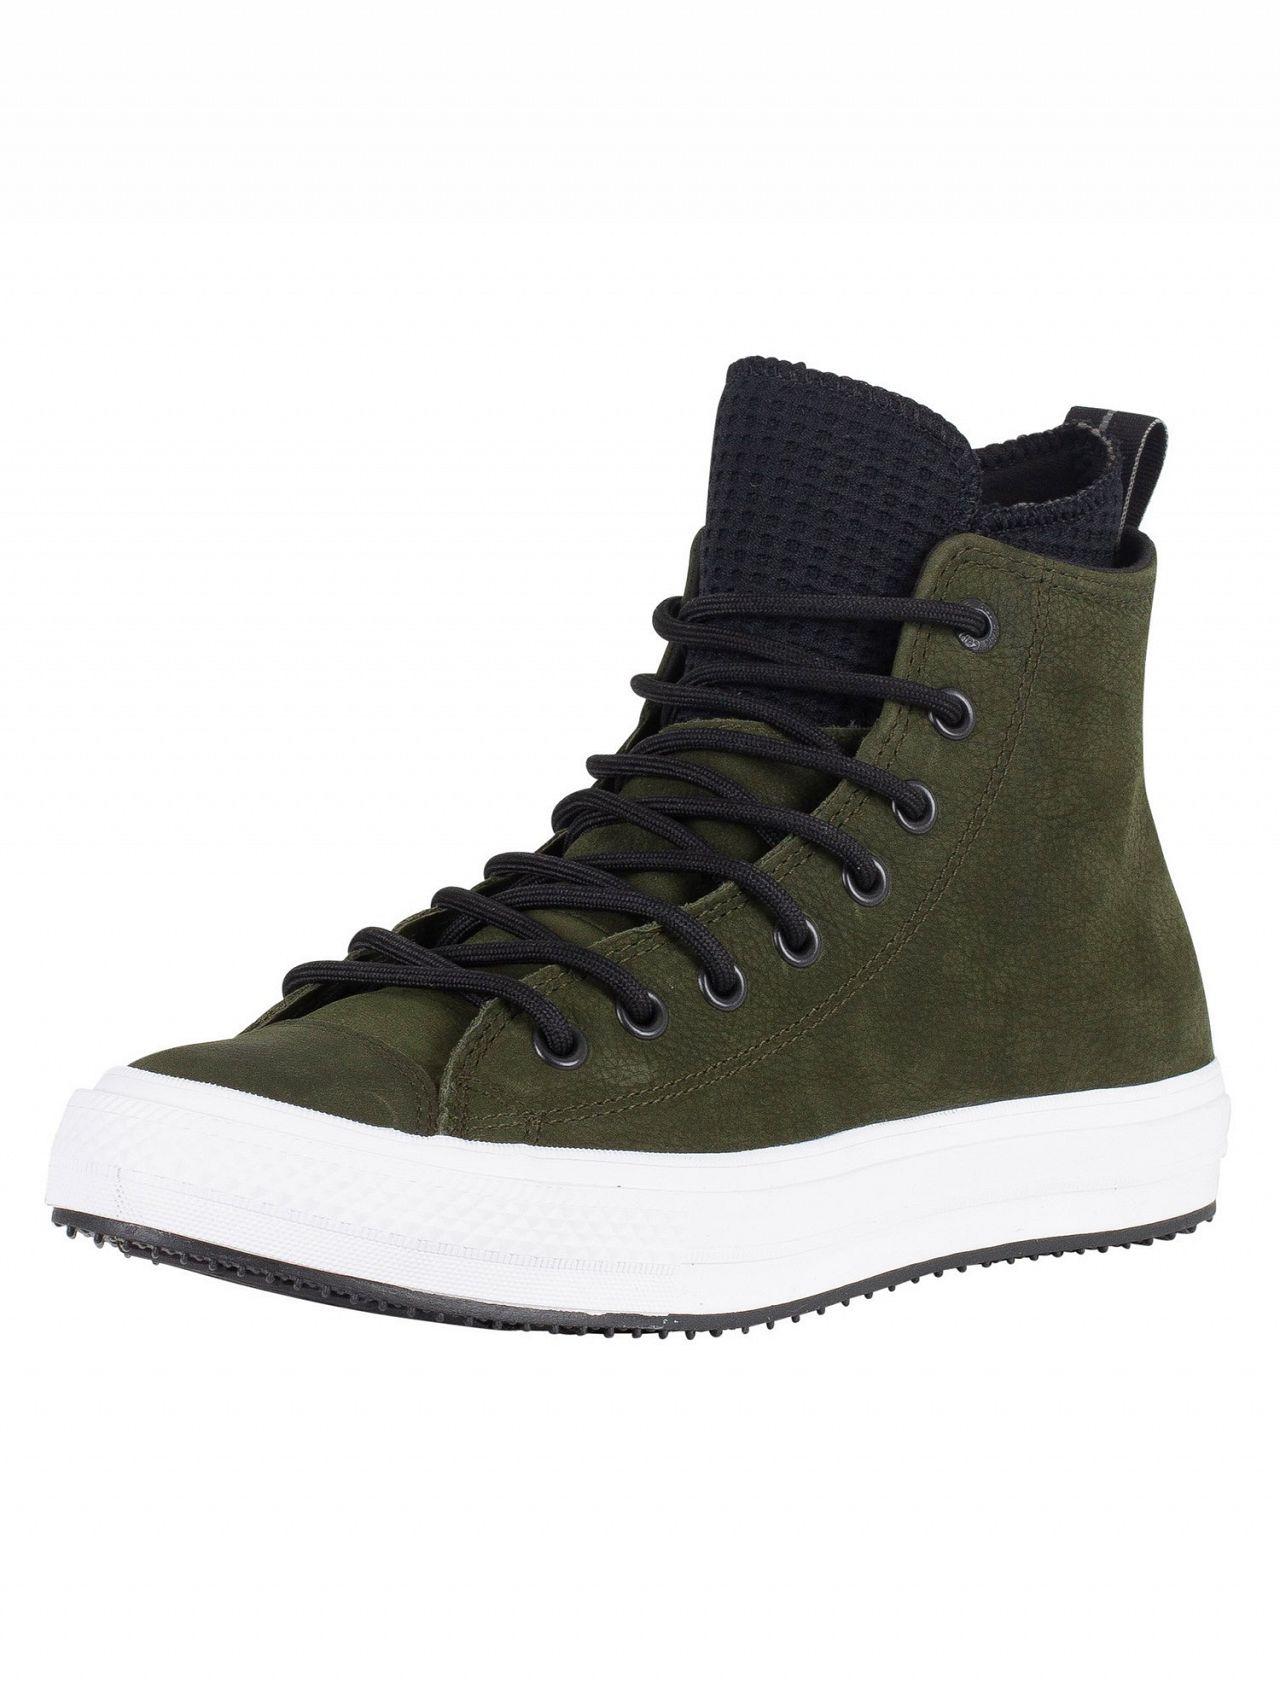 Converse Utility Green Black White CT All Star Hi WP Leather Boots ... 8f3cb420e